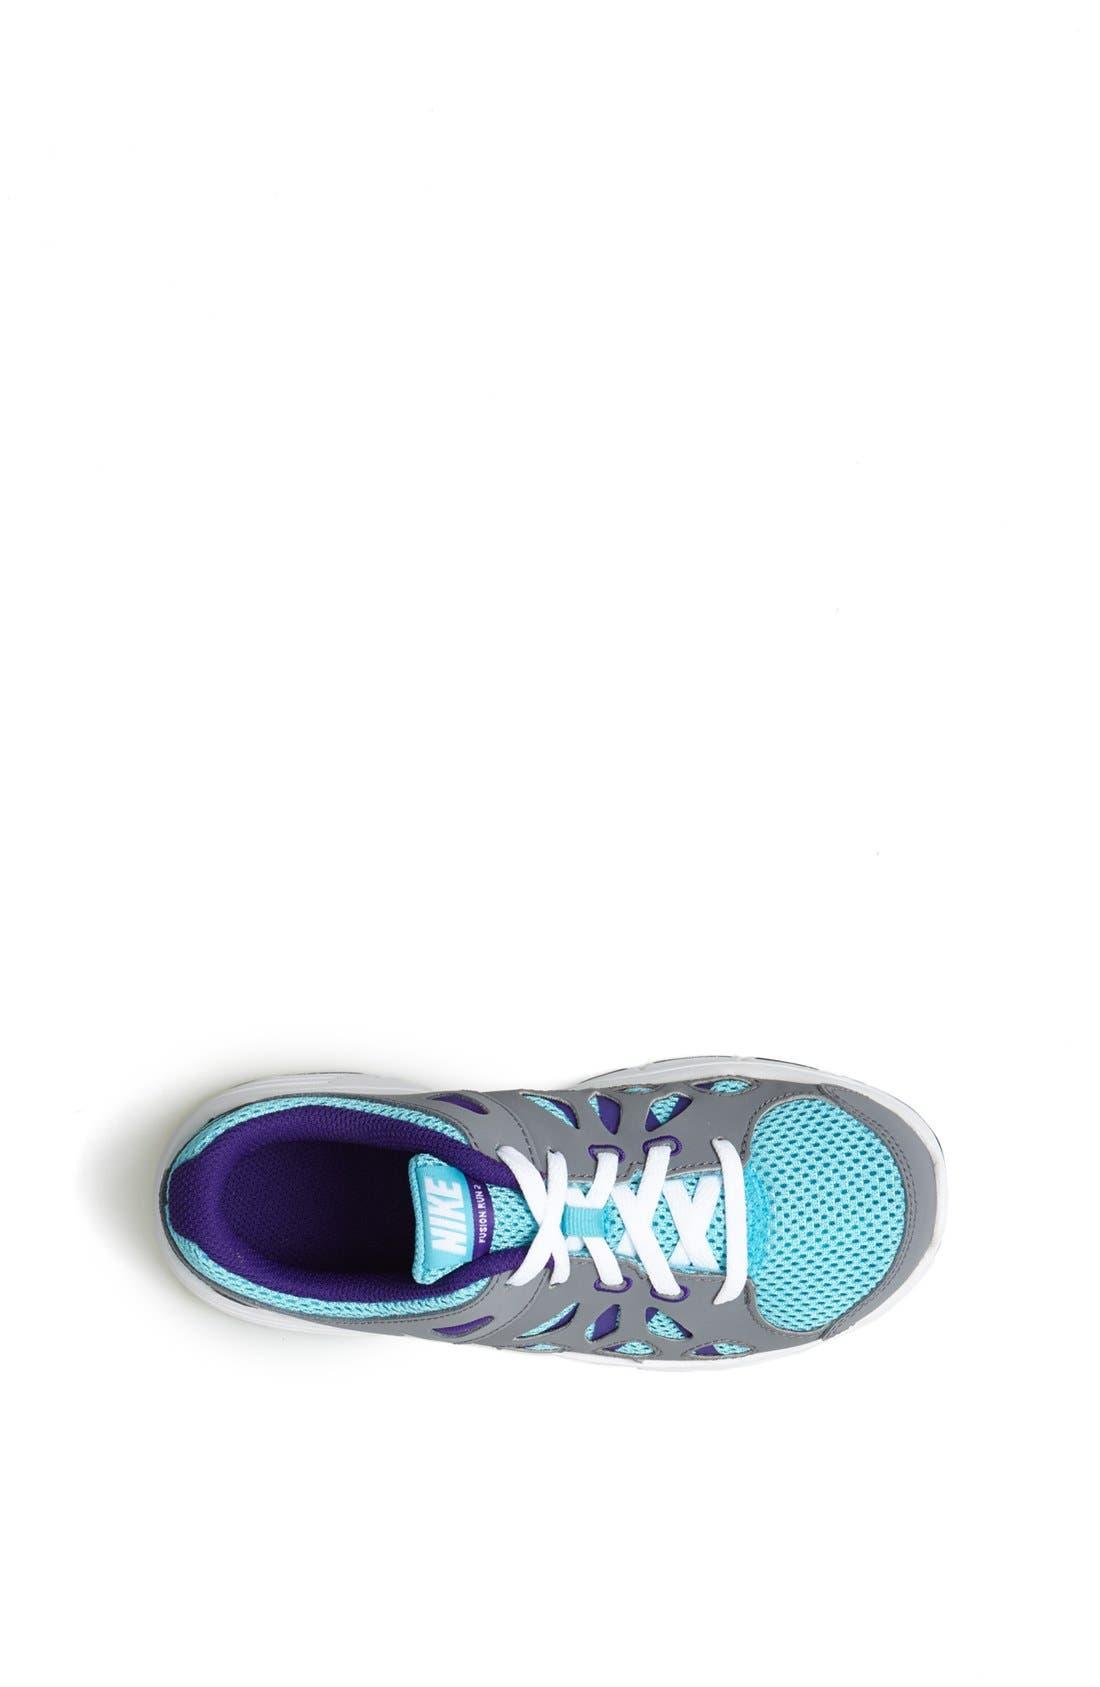 Alternate Image 3  - Nike 'Fusion Run' Athletic Shoe (Toddler & Little Kid)